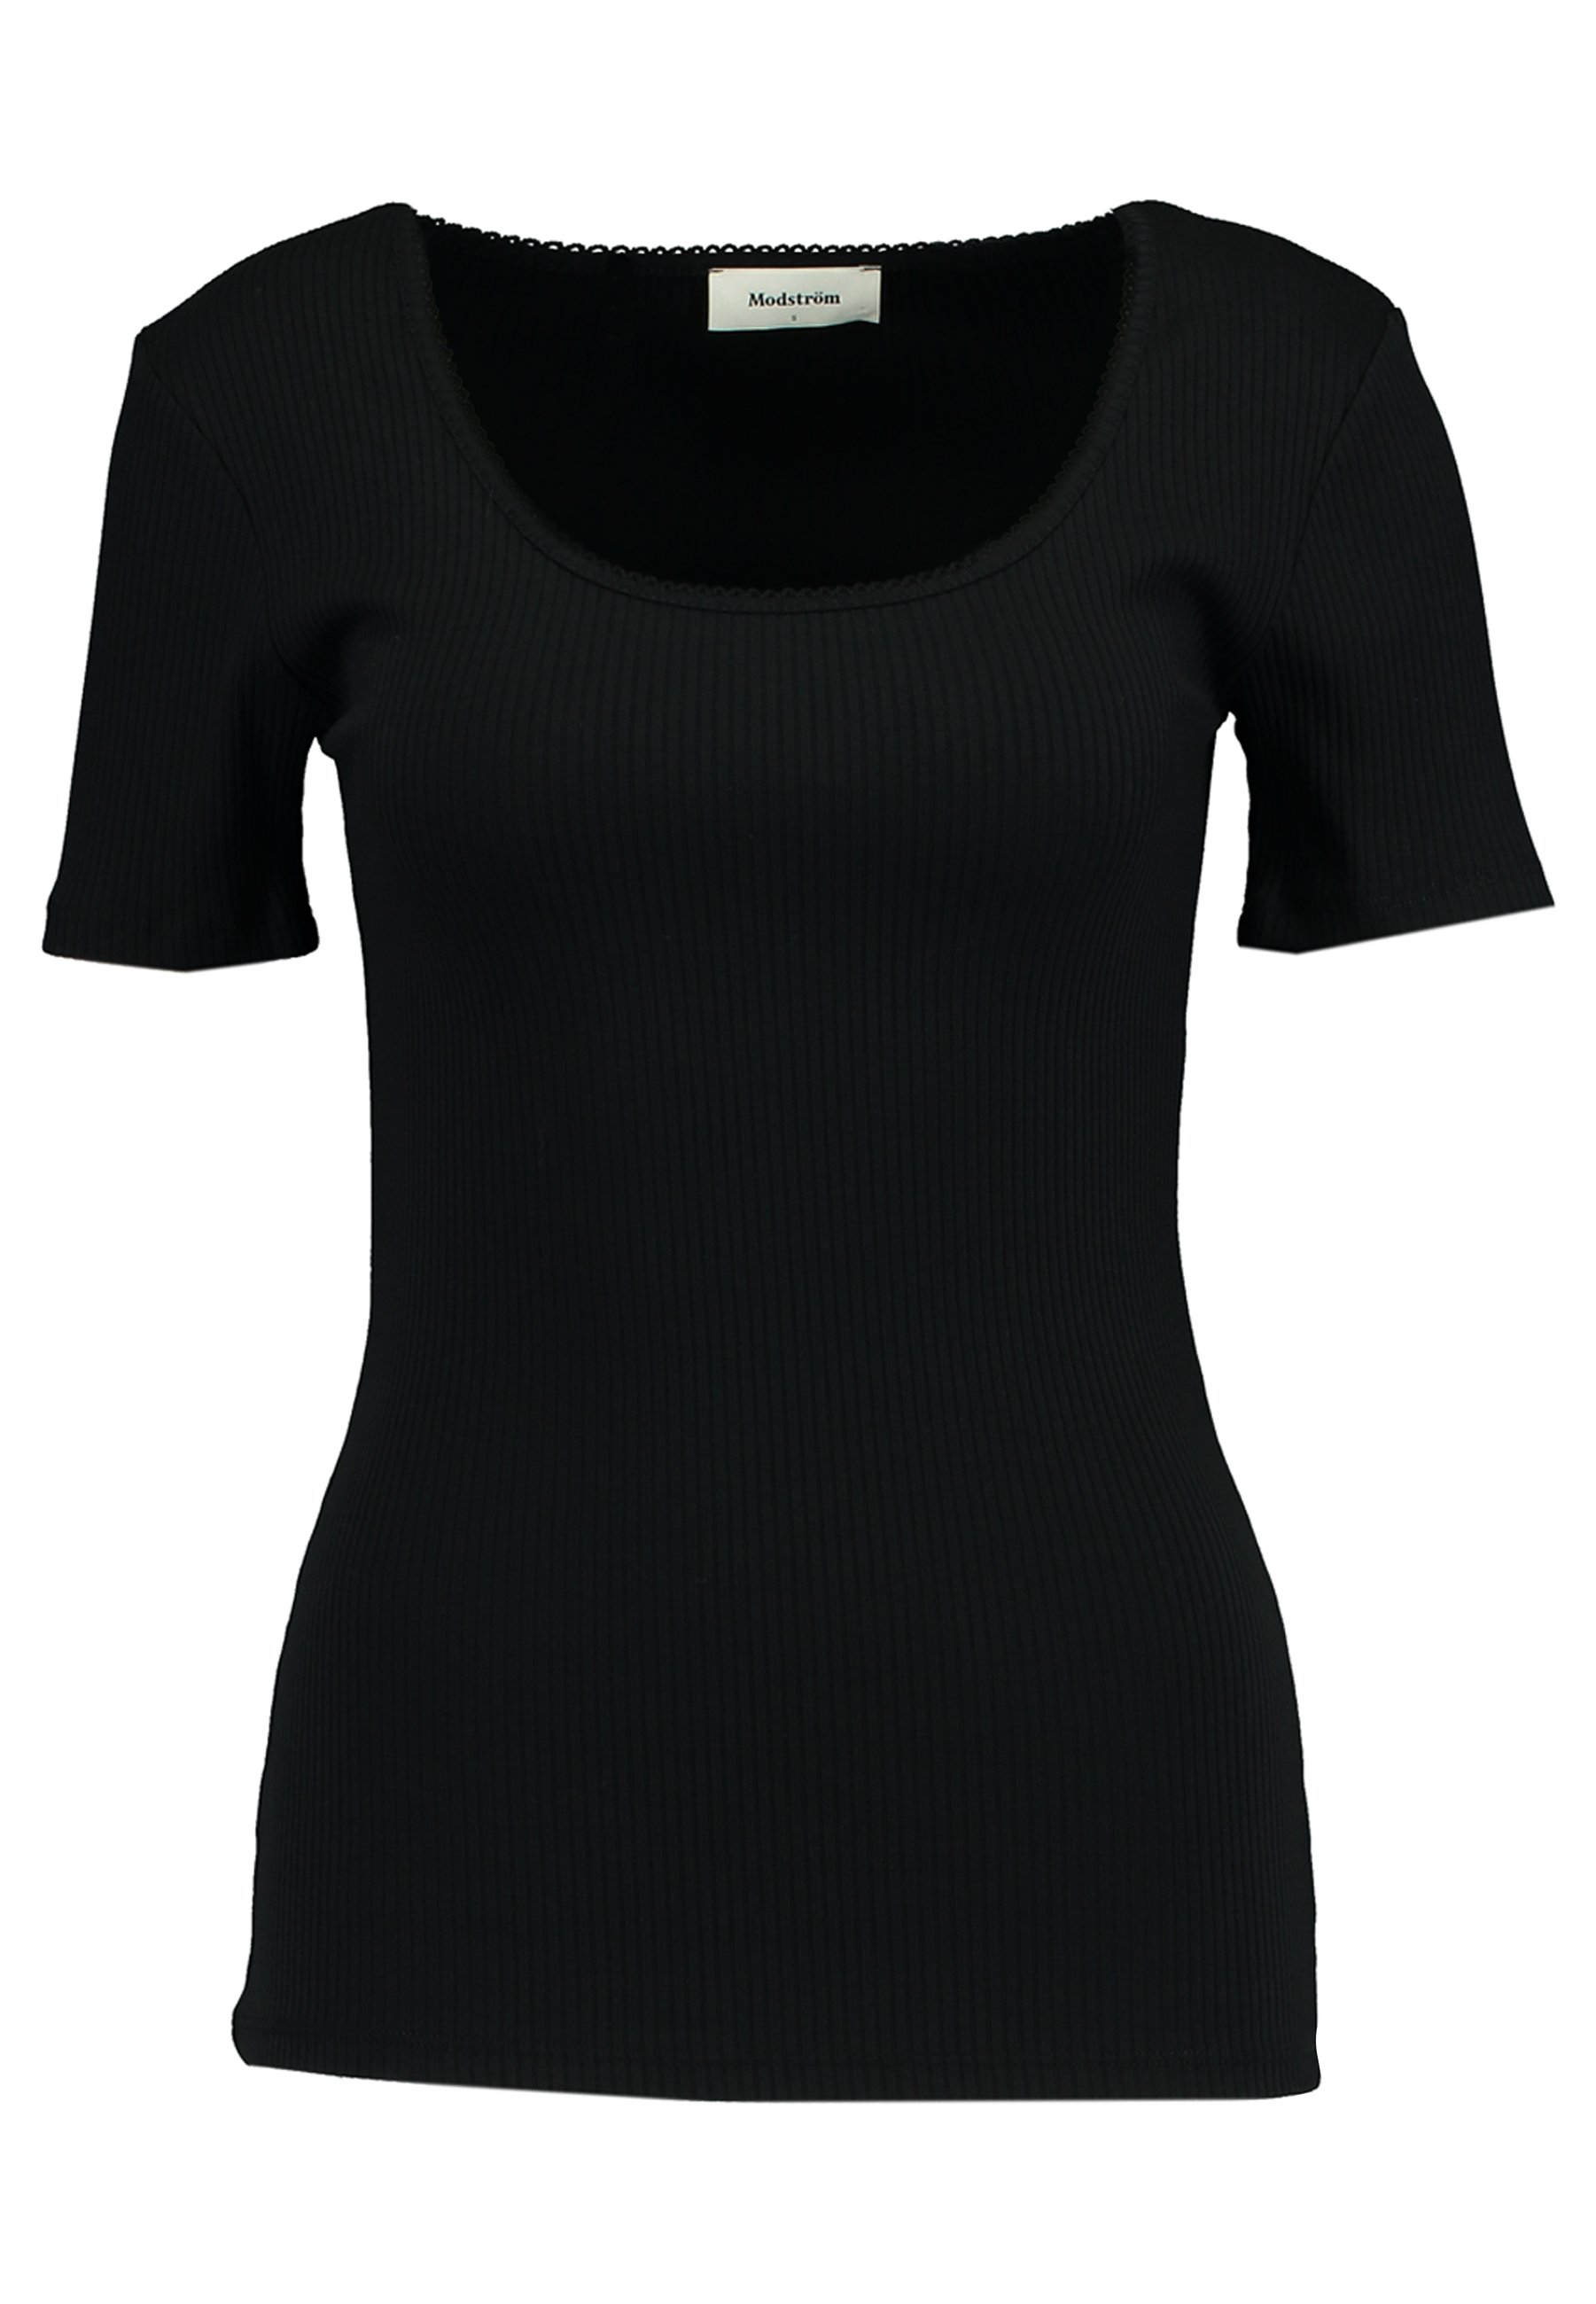 Modström Aron - T-shirt Basic Black ParlHUA